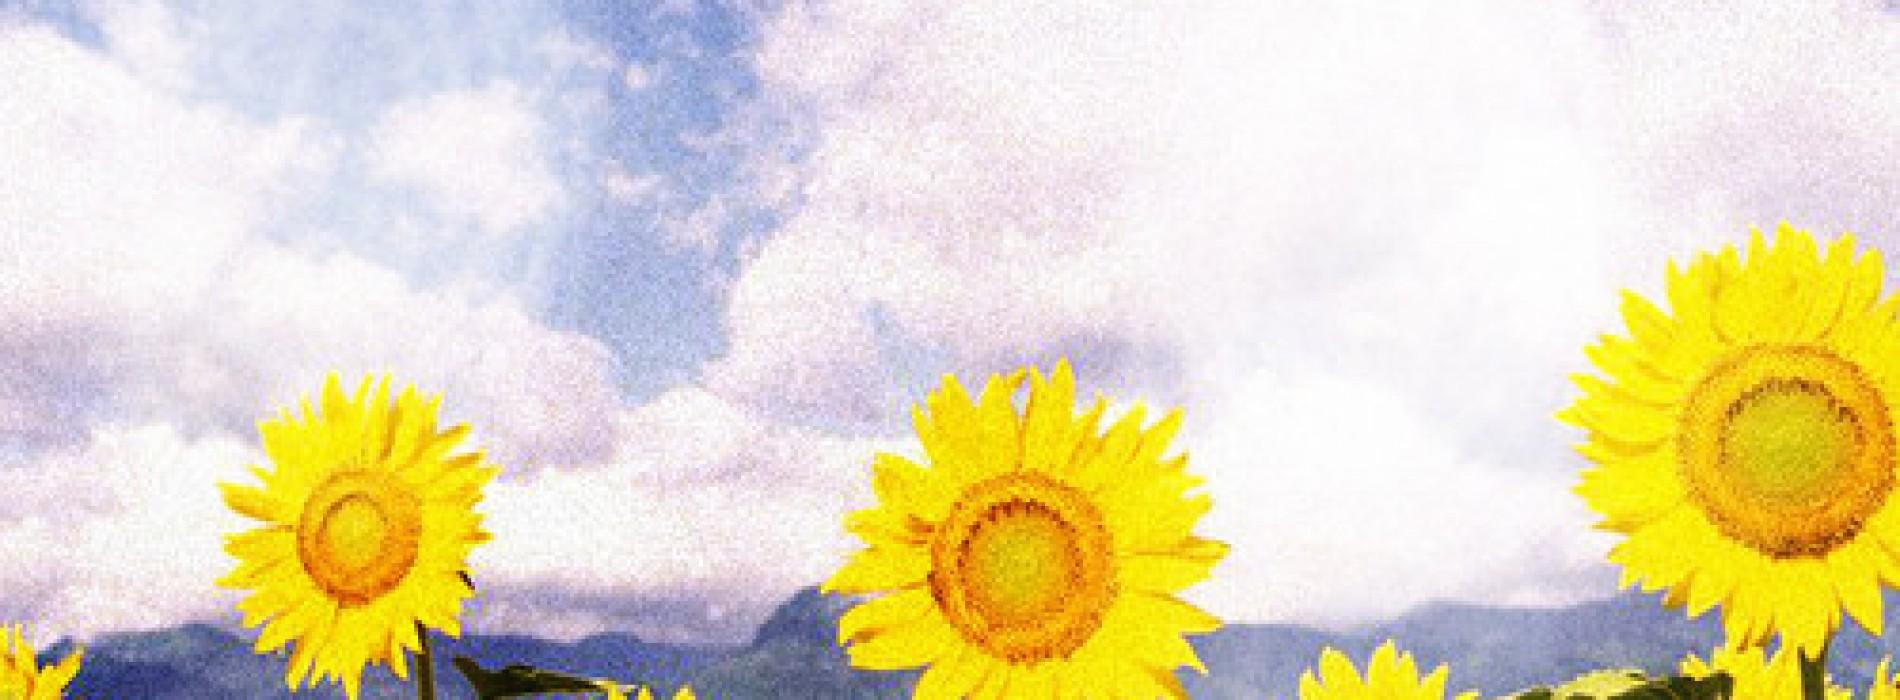 iClown-Sunflower